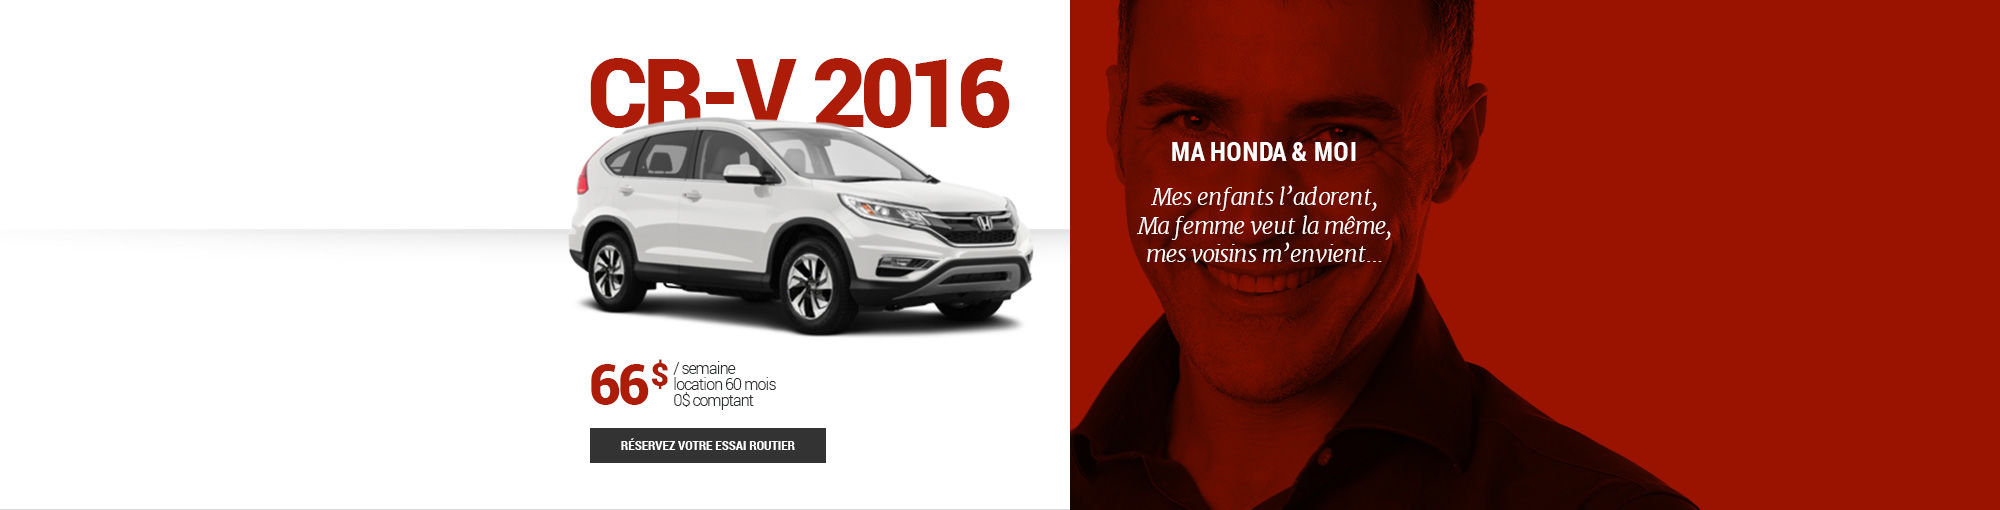 CR-V 2016 - mai-juin-juillet-août-septembre